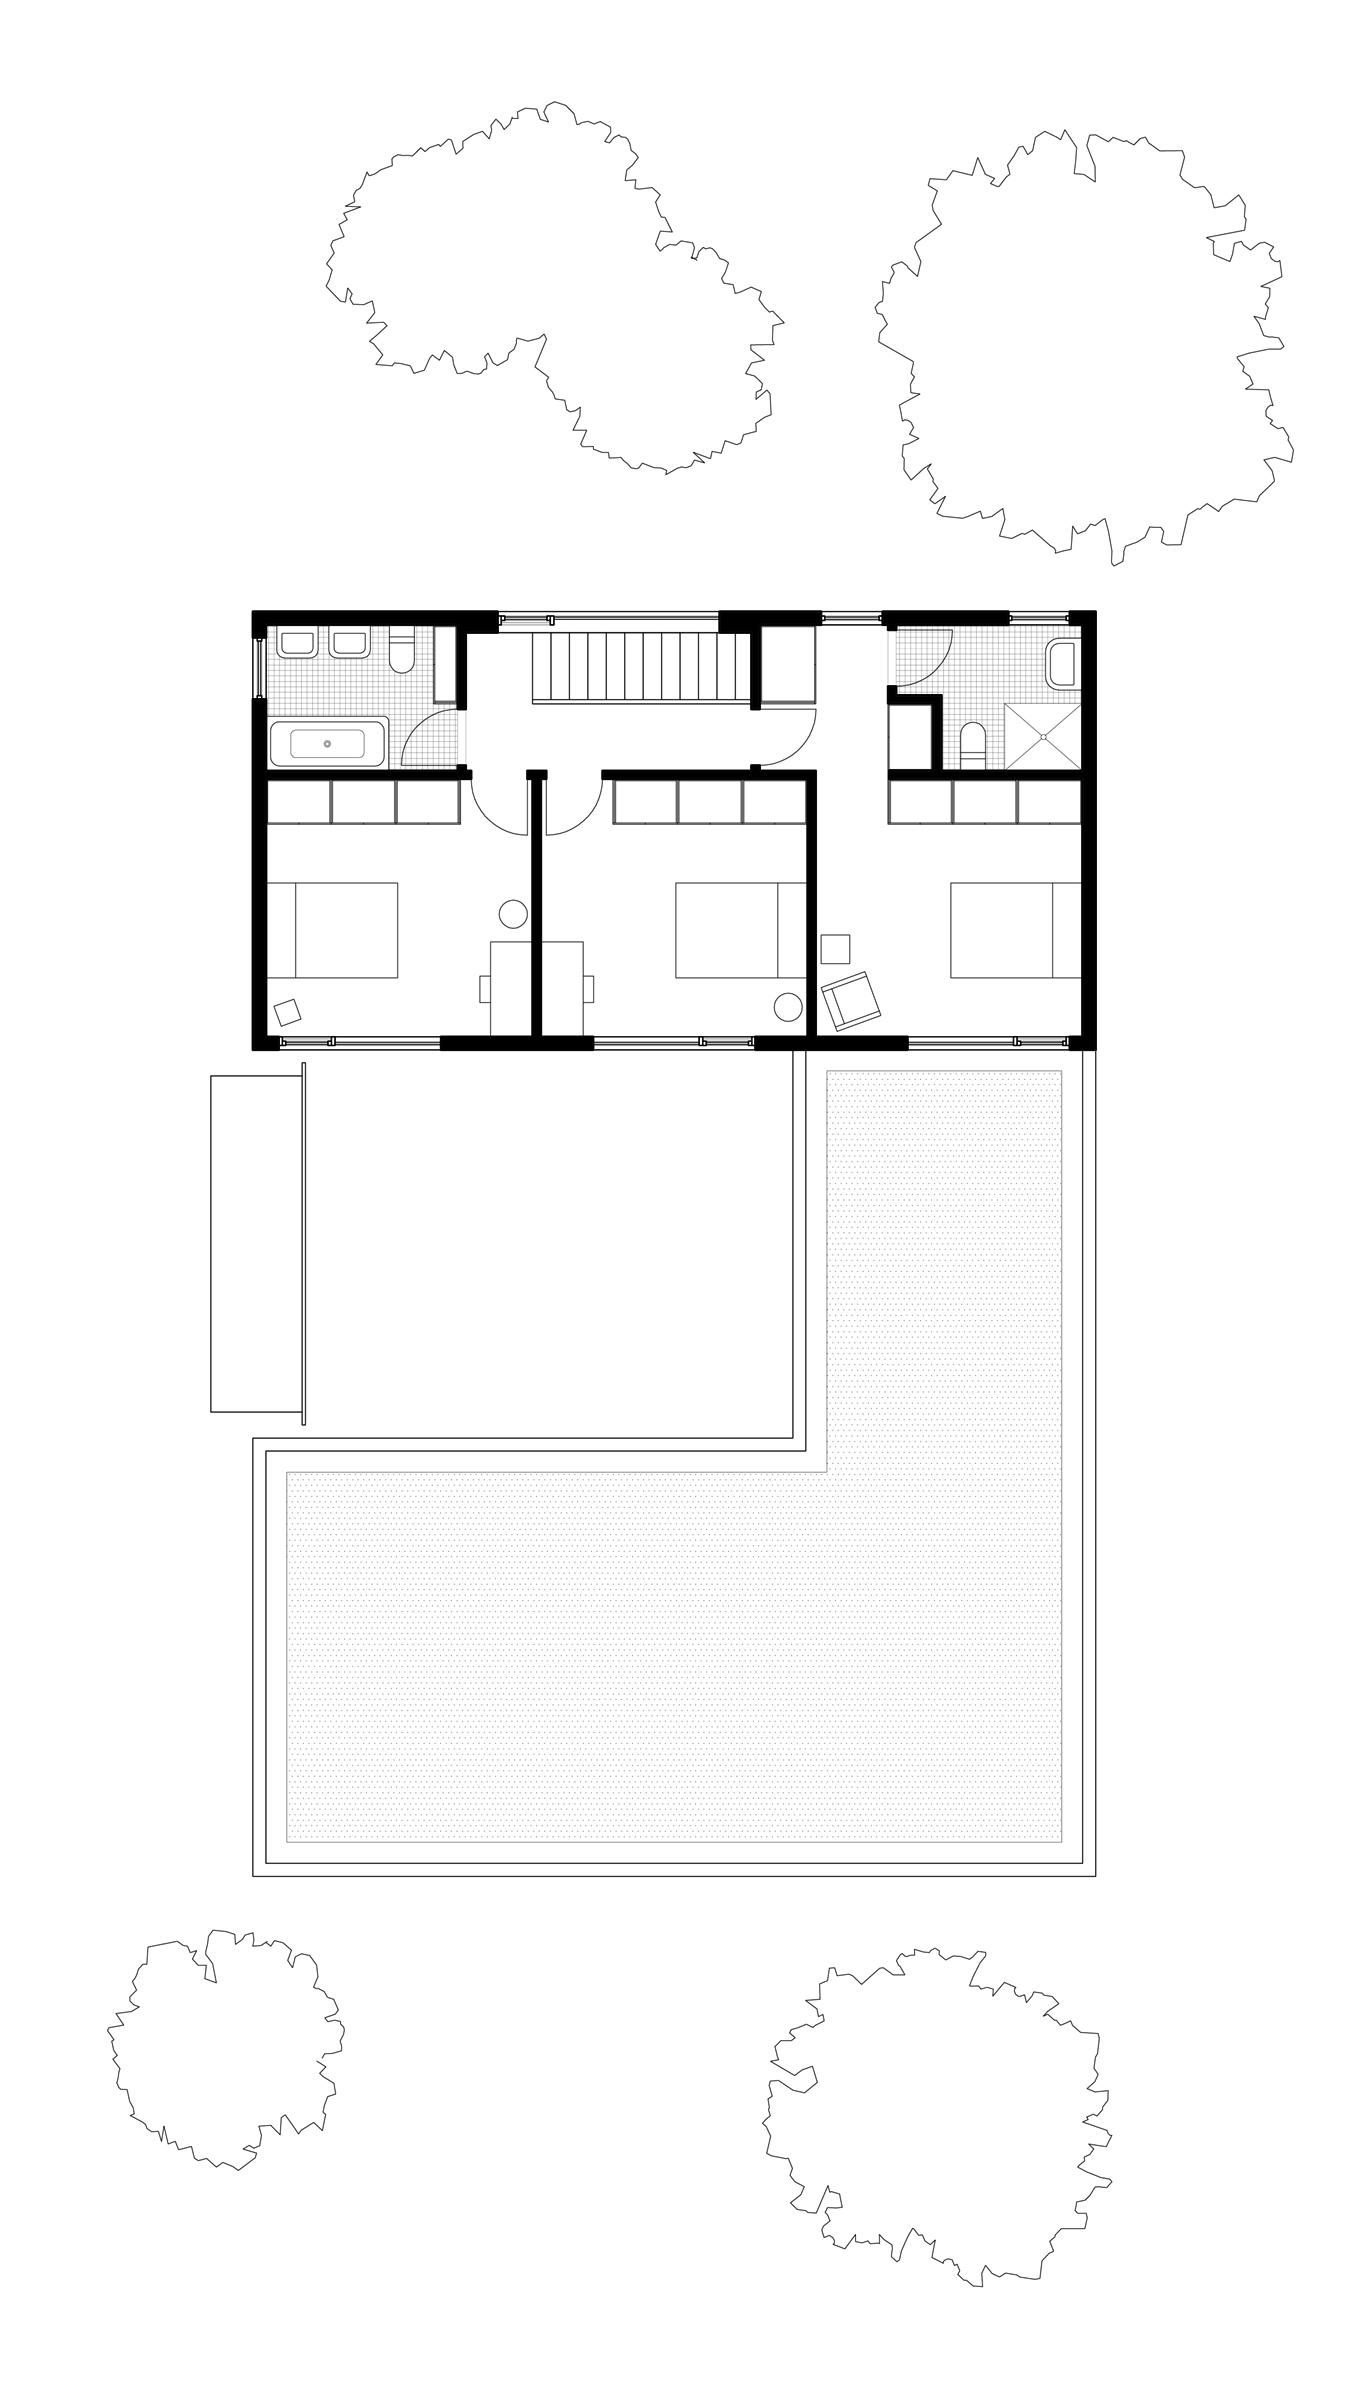 West Linn House second floor plan